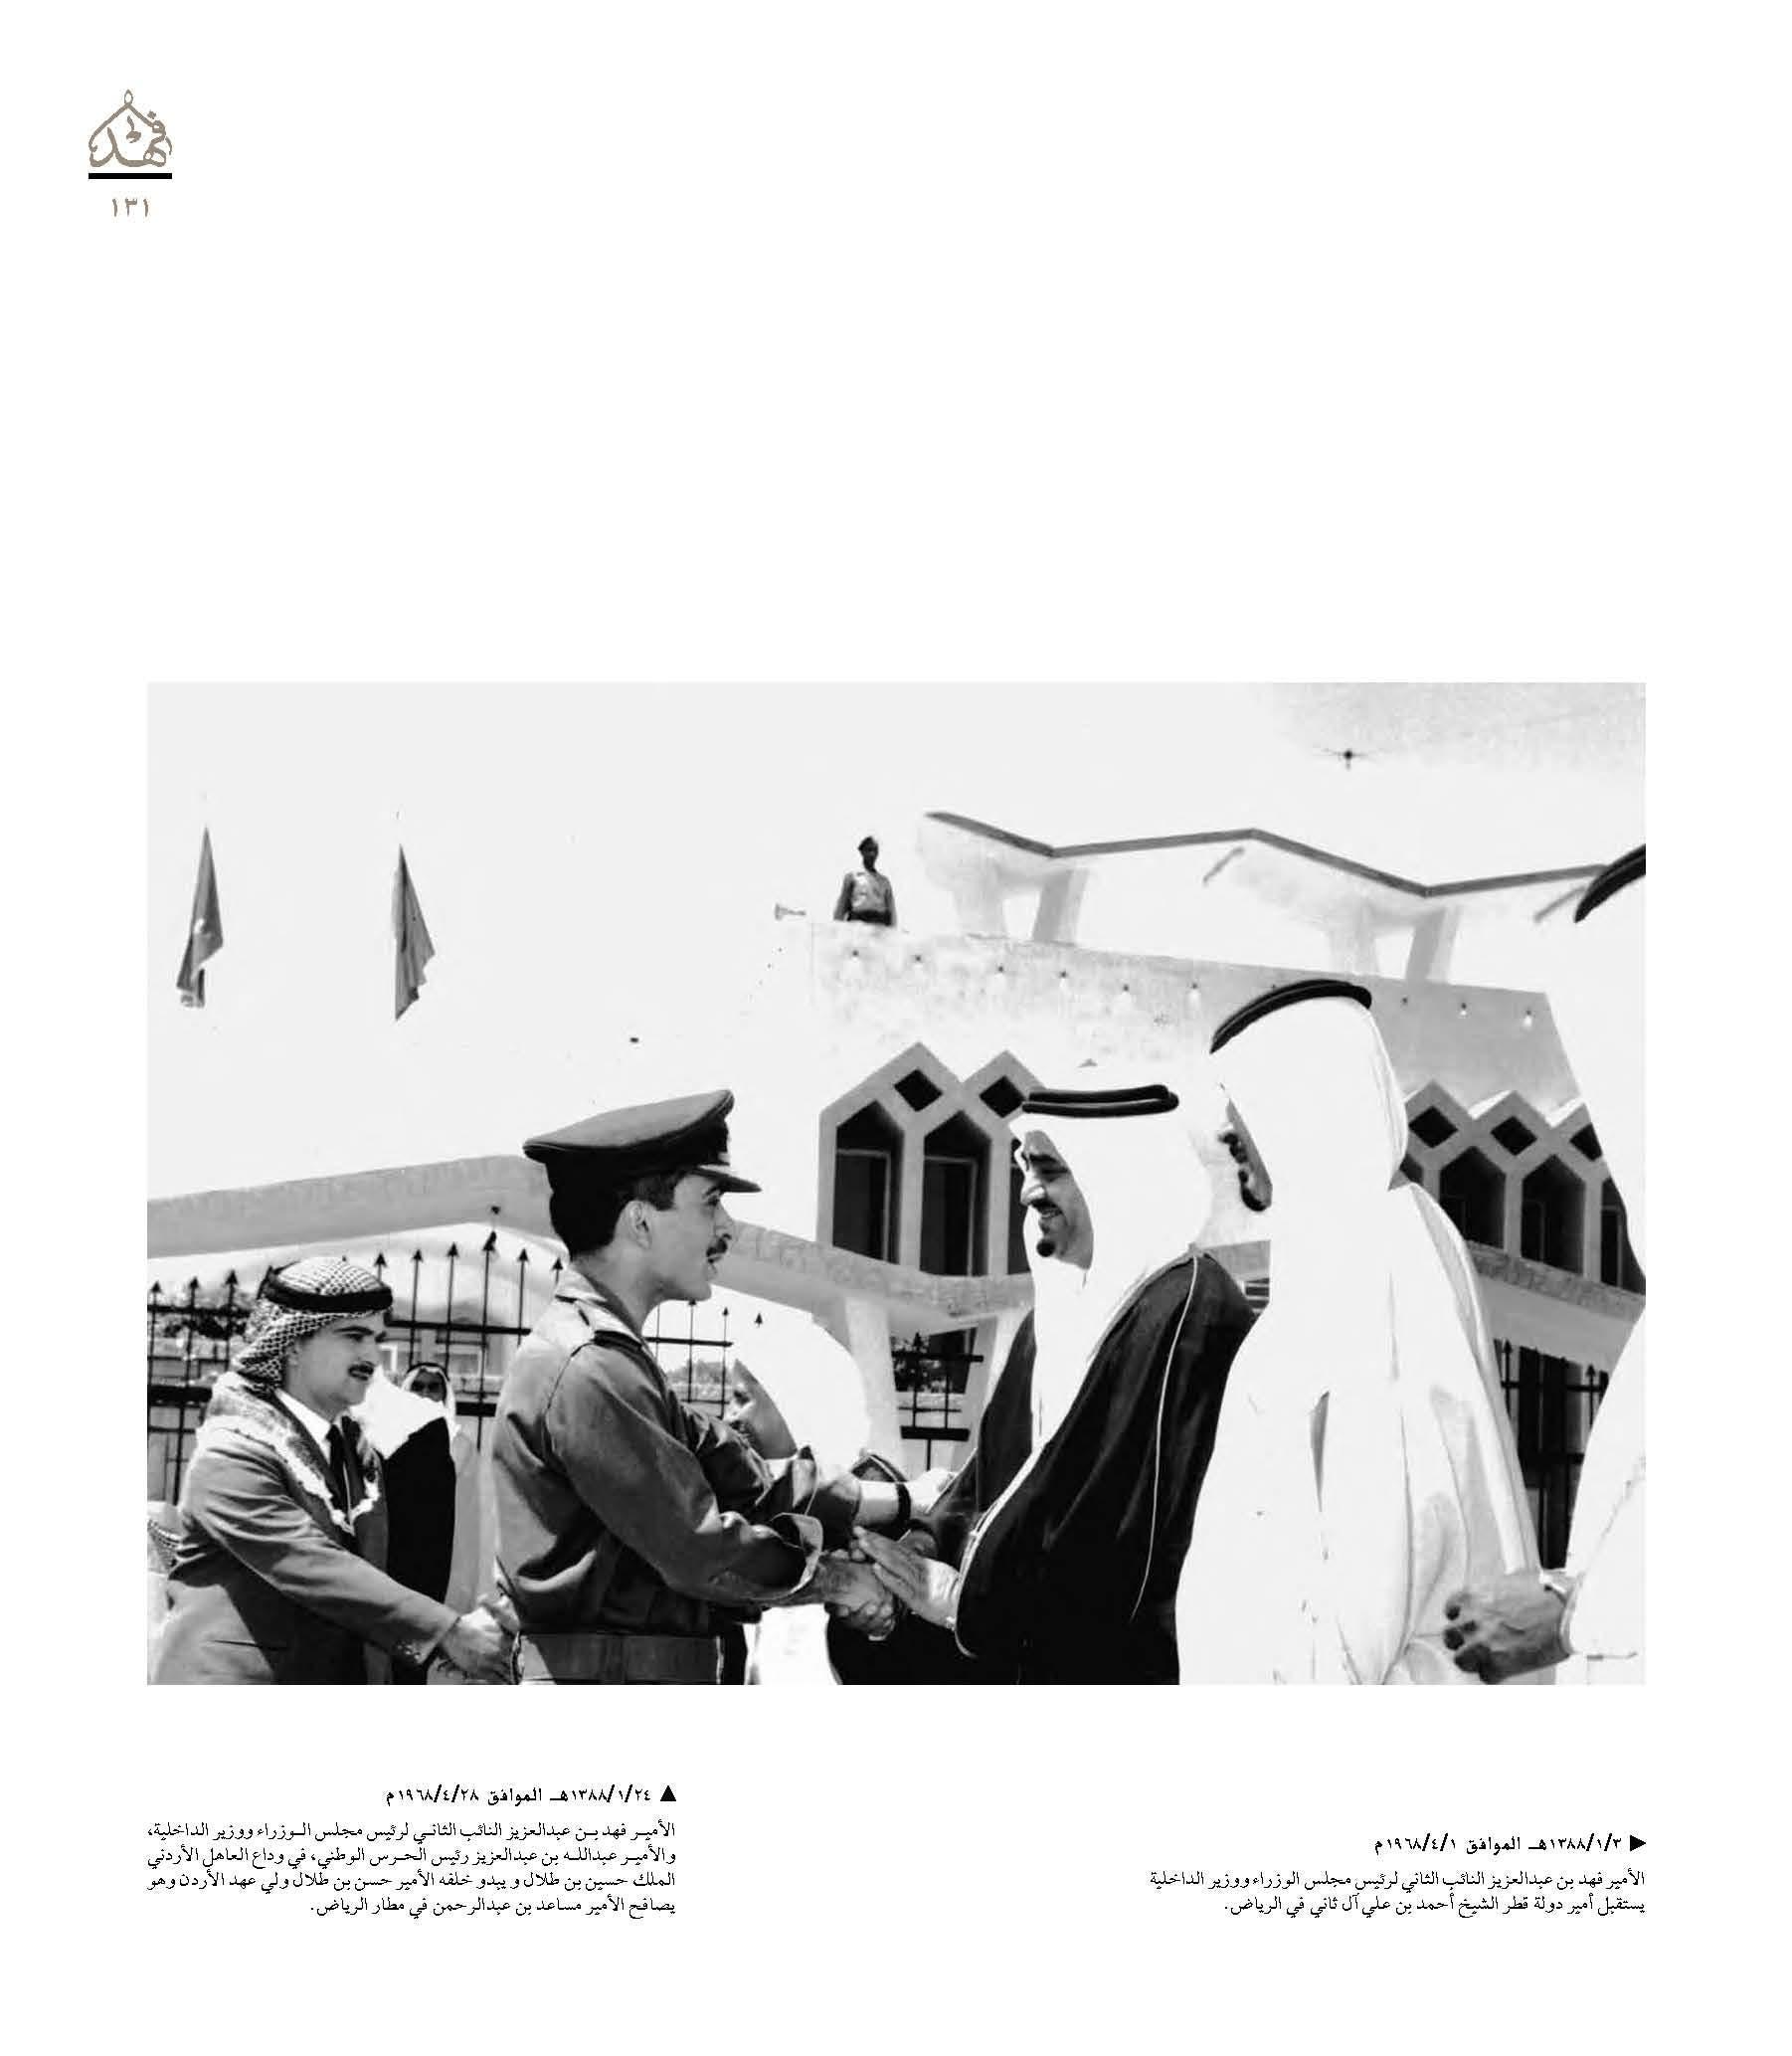 "صور نادرة للملك فهد في ""كتاب"" Da8f4941-f6d9-44ca-8e8b-4128589e4156"